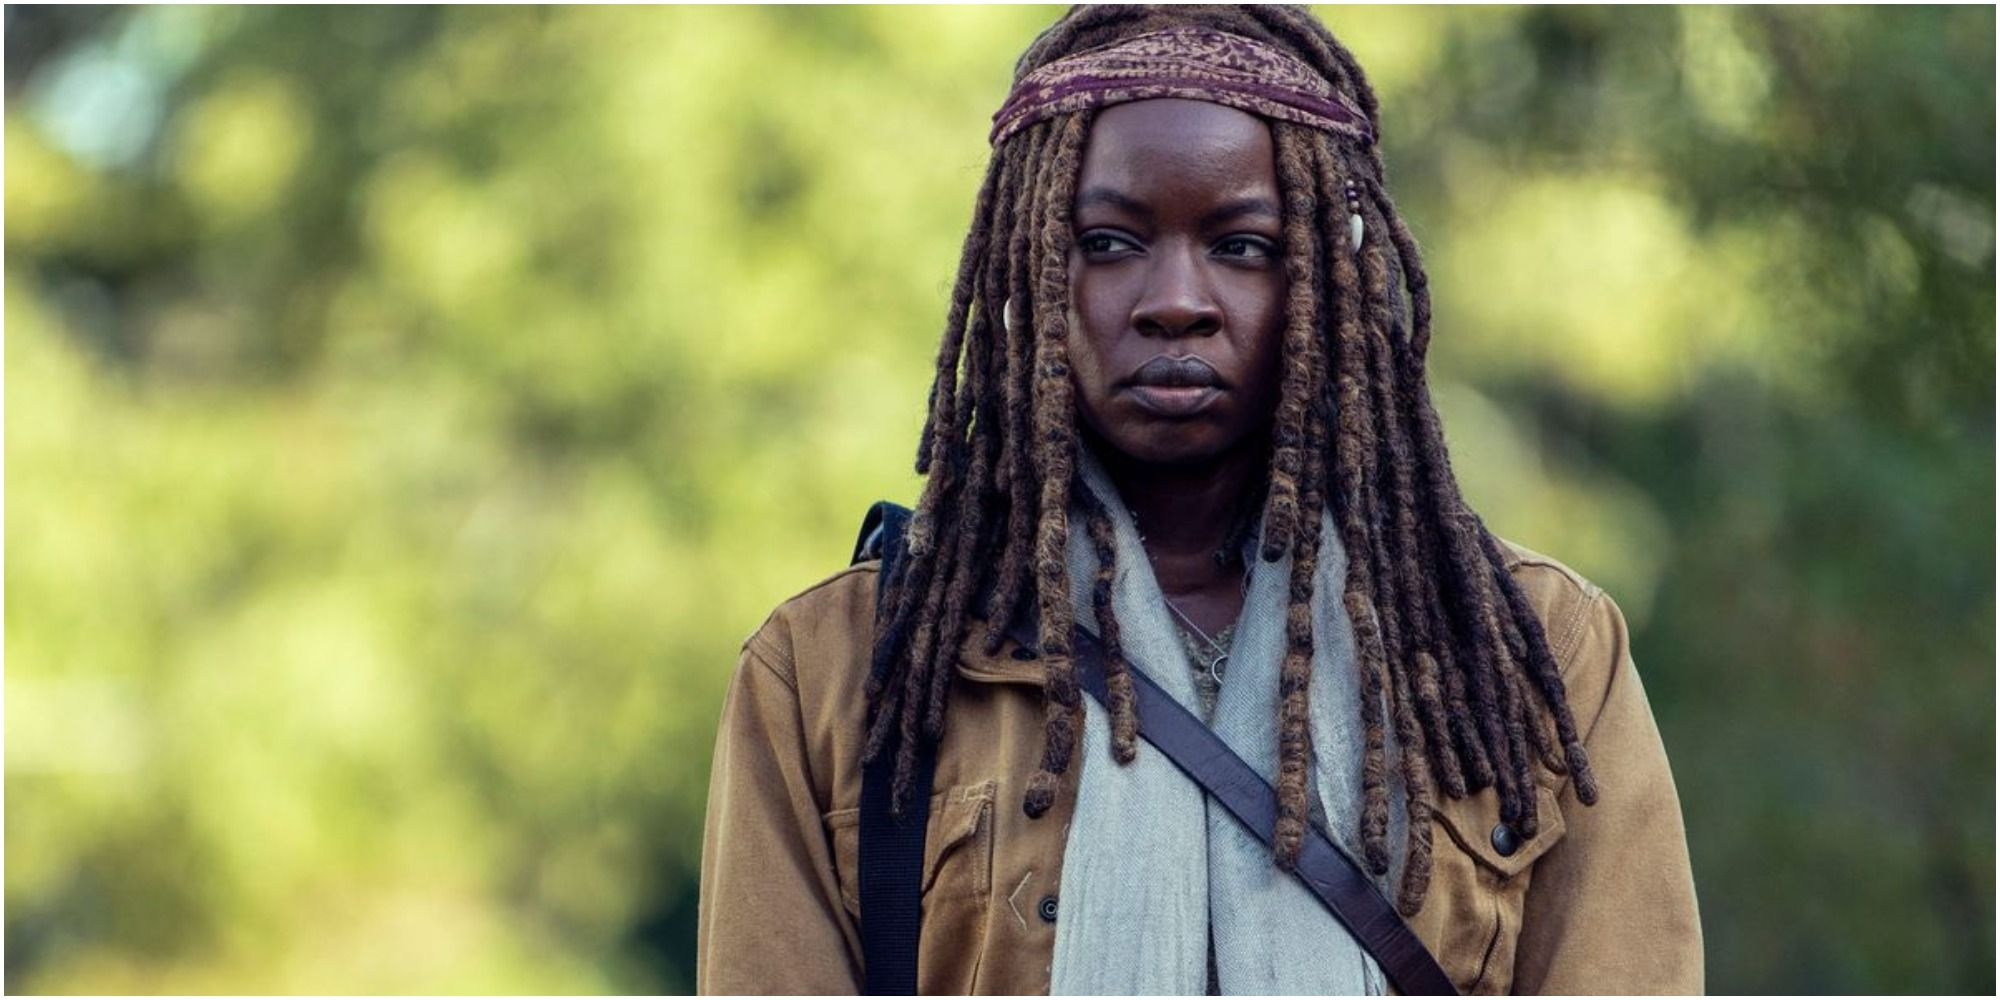 Walking Dead Season 10 Posters Highlight Michonne, Alpha & More